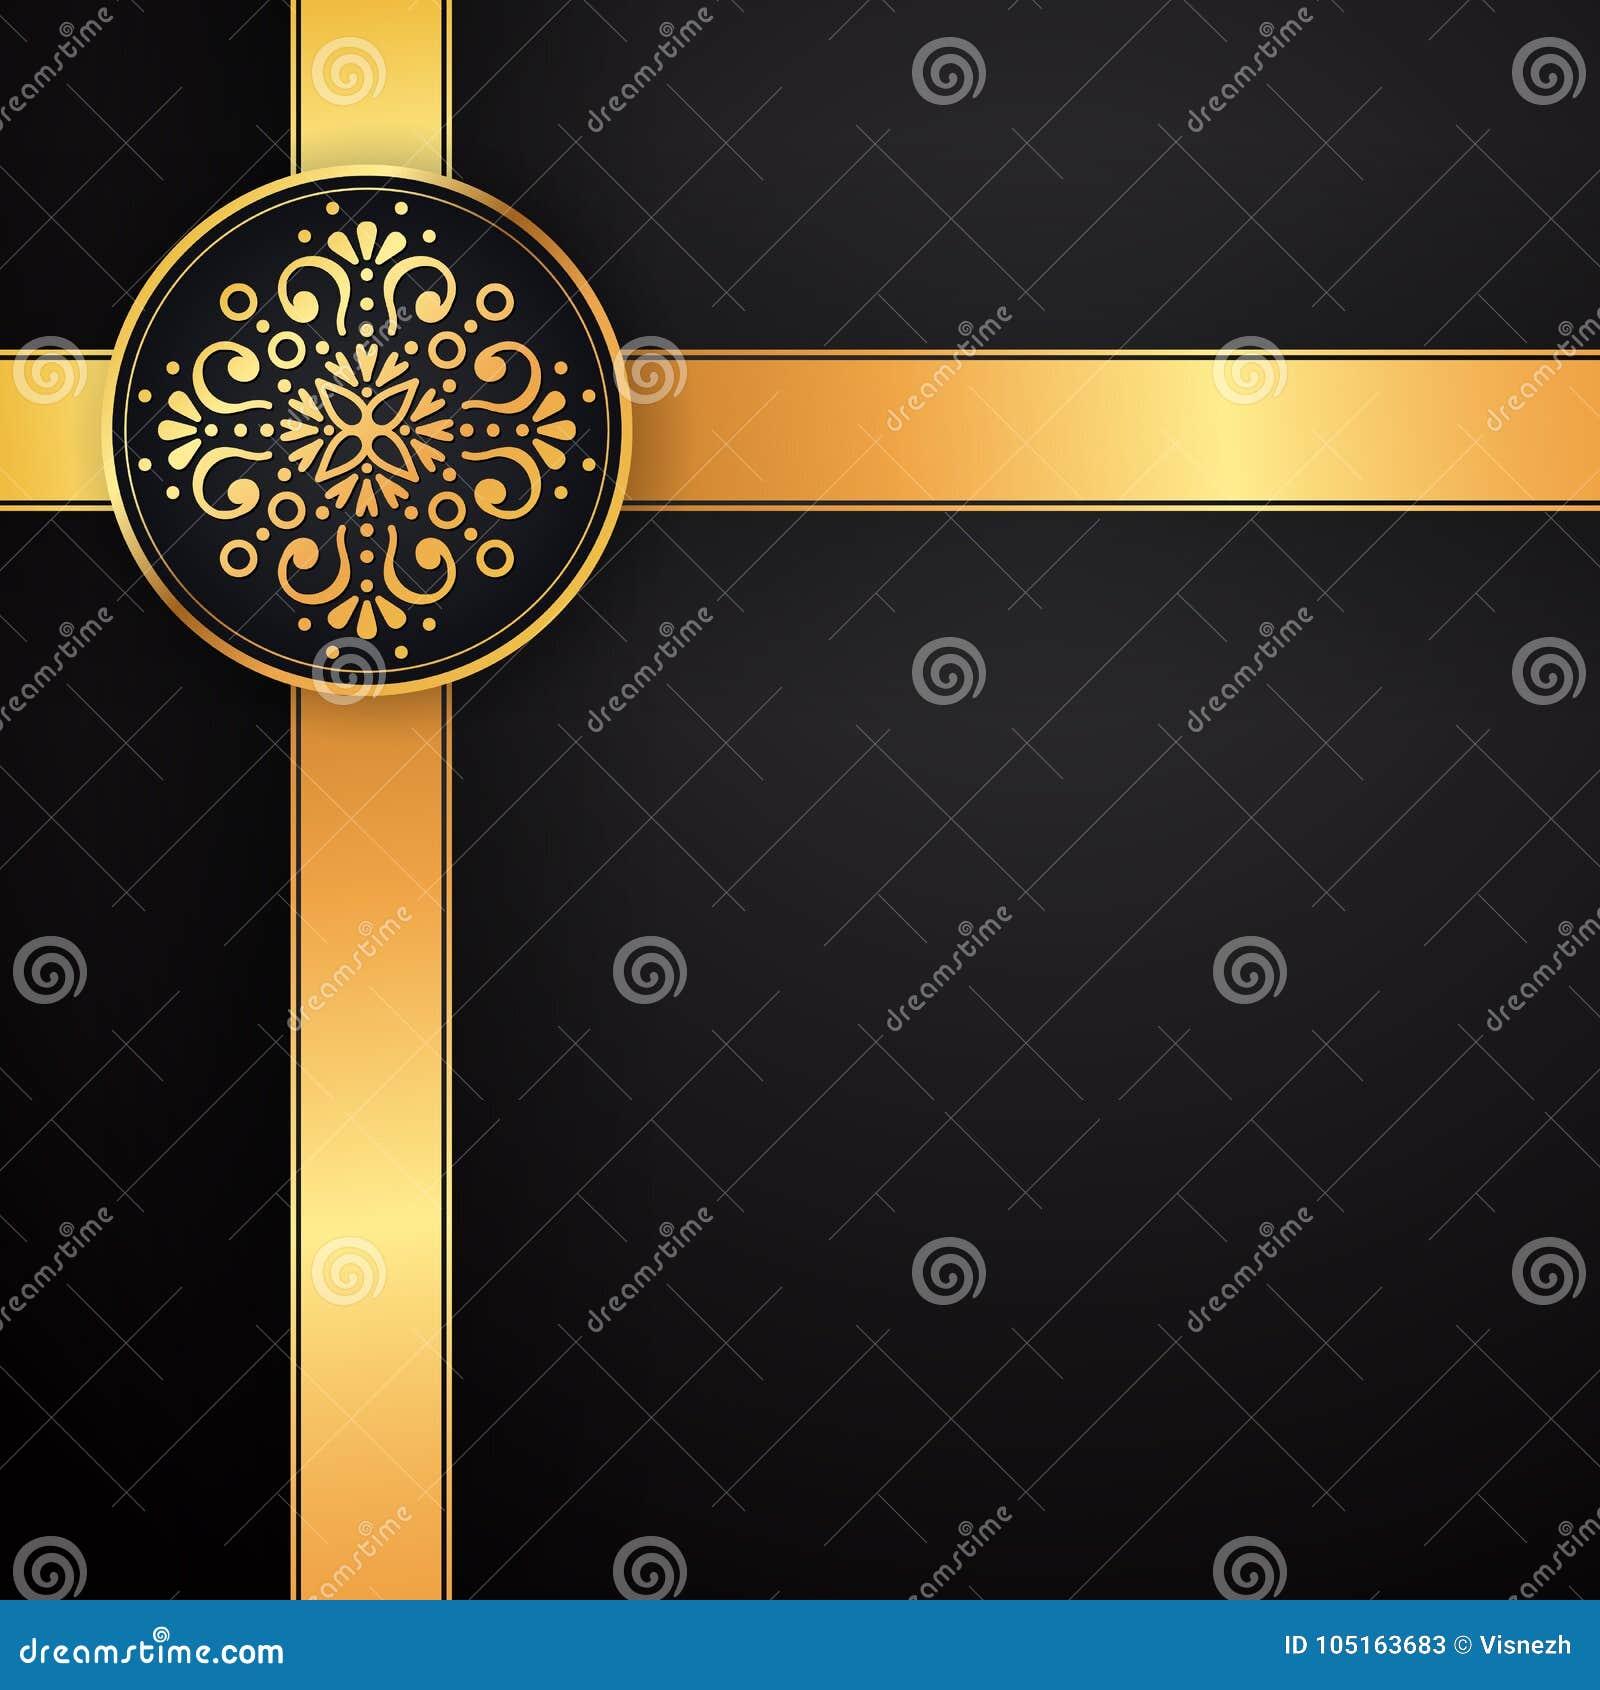 dc312964de9 Gold black background design vector. Sun Indian pattern. Eye peacock  feather frame. Oriental